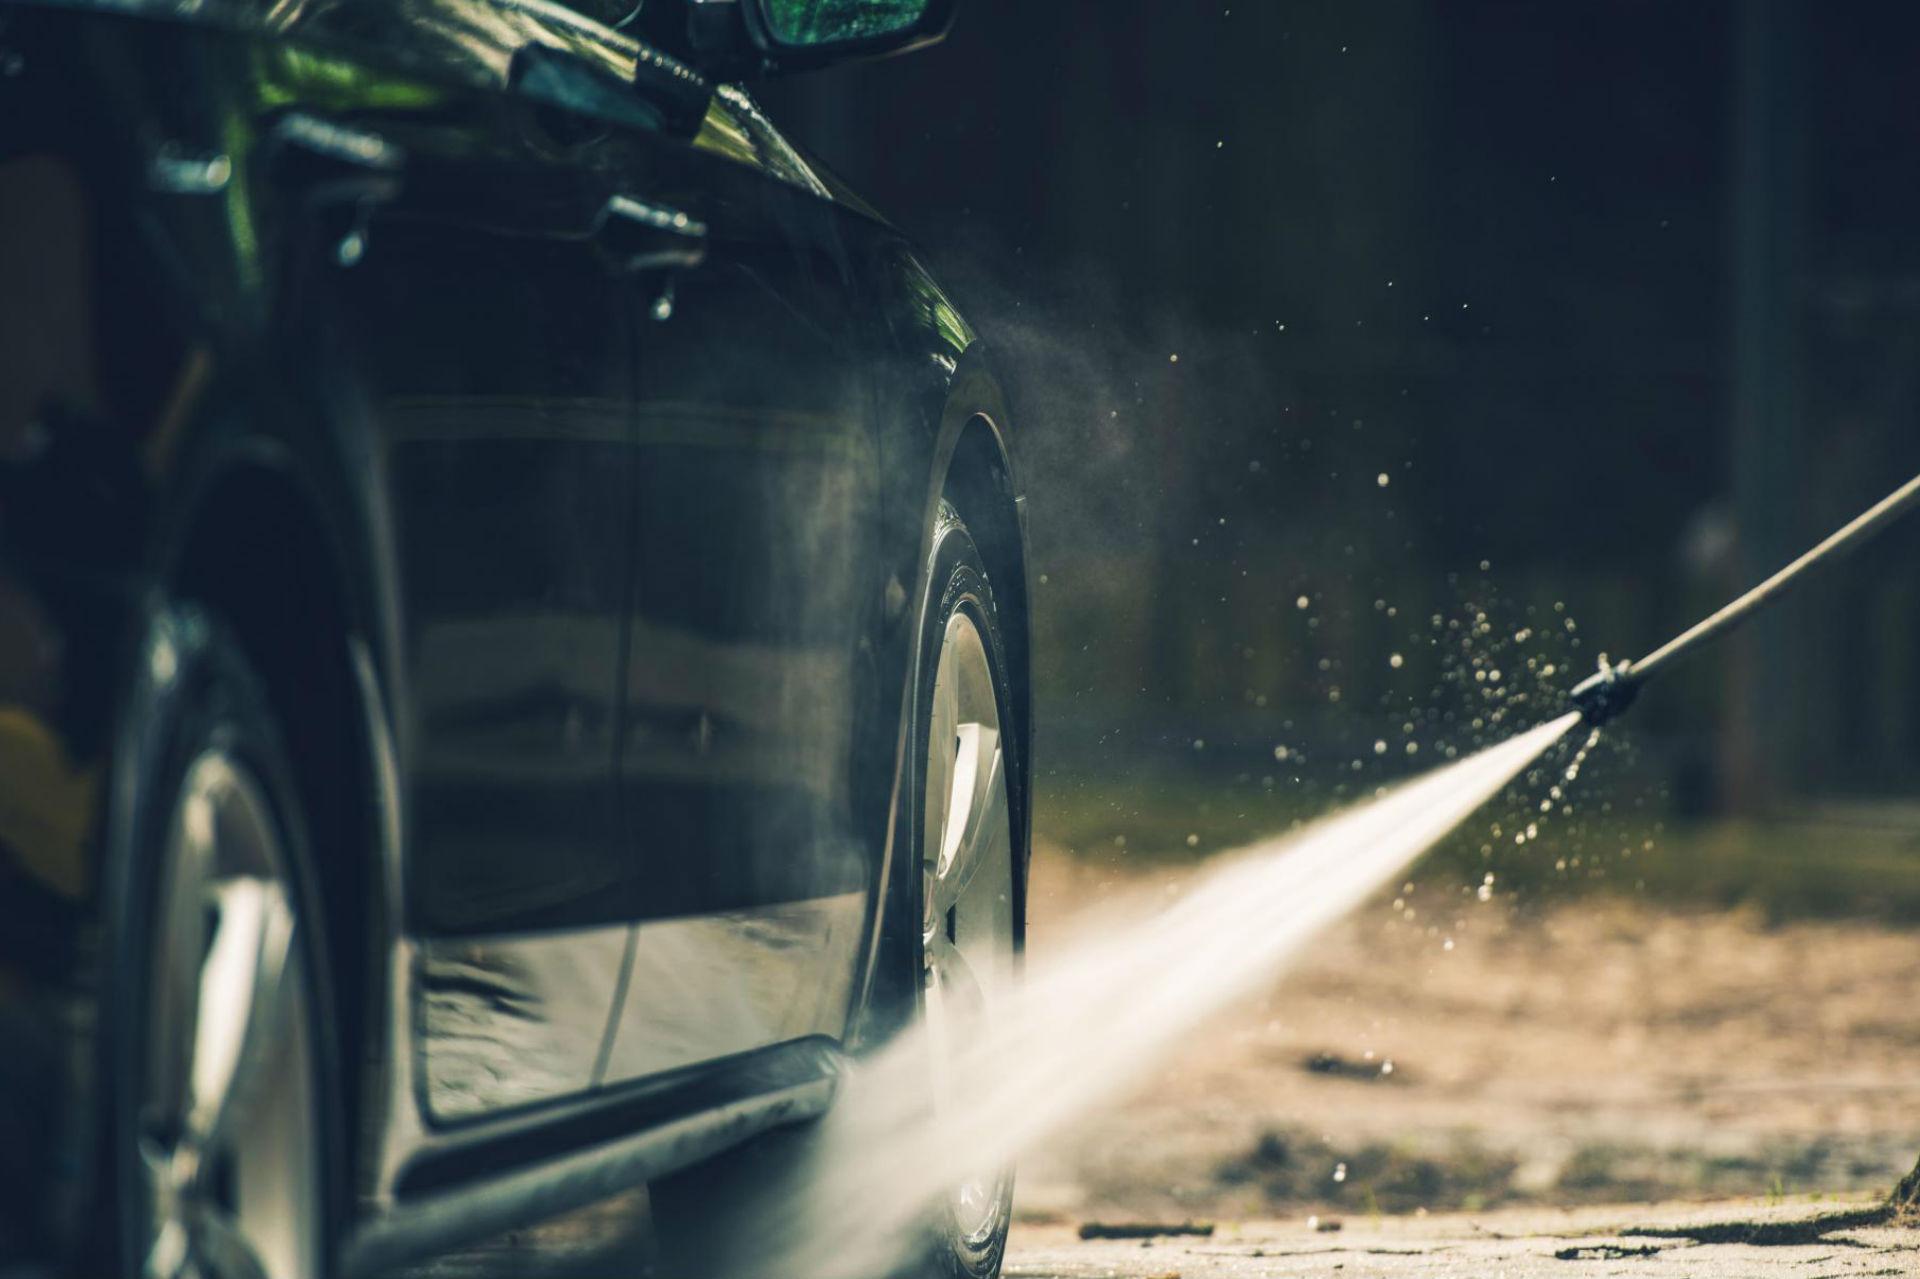 detailed-car-washing-PQEE2QY